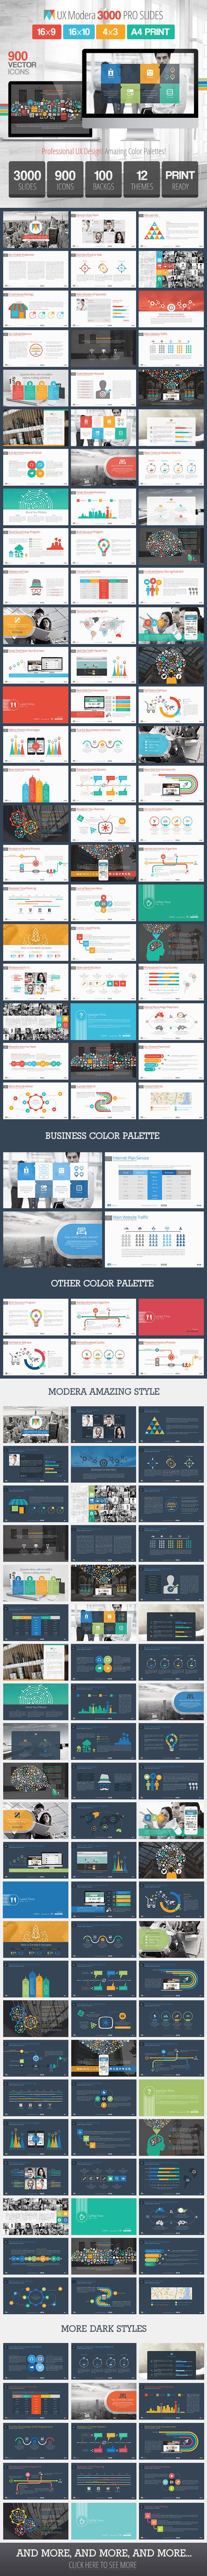 UX Modera Presentation Template for Keynote - Business Keynote Templates